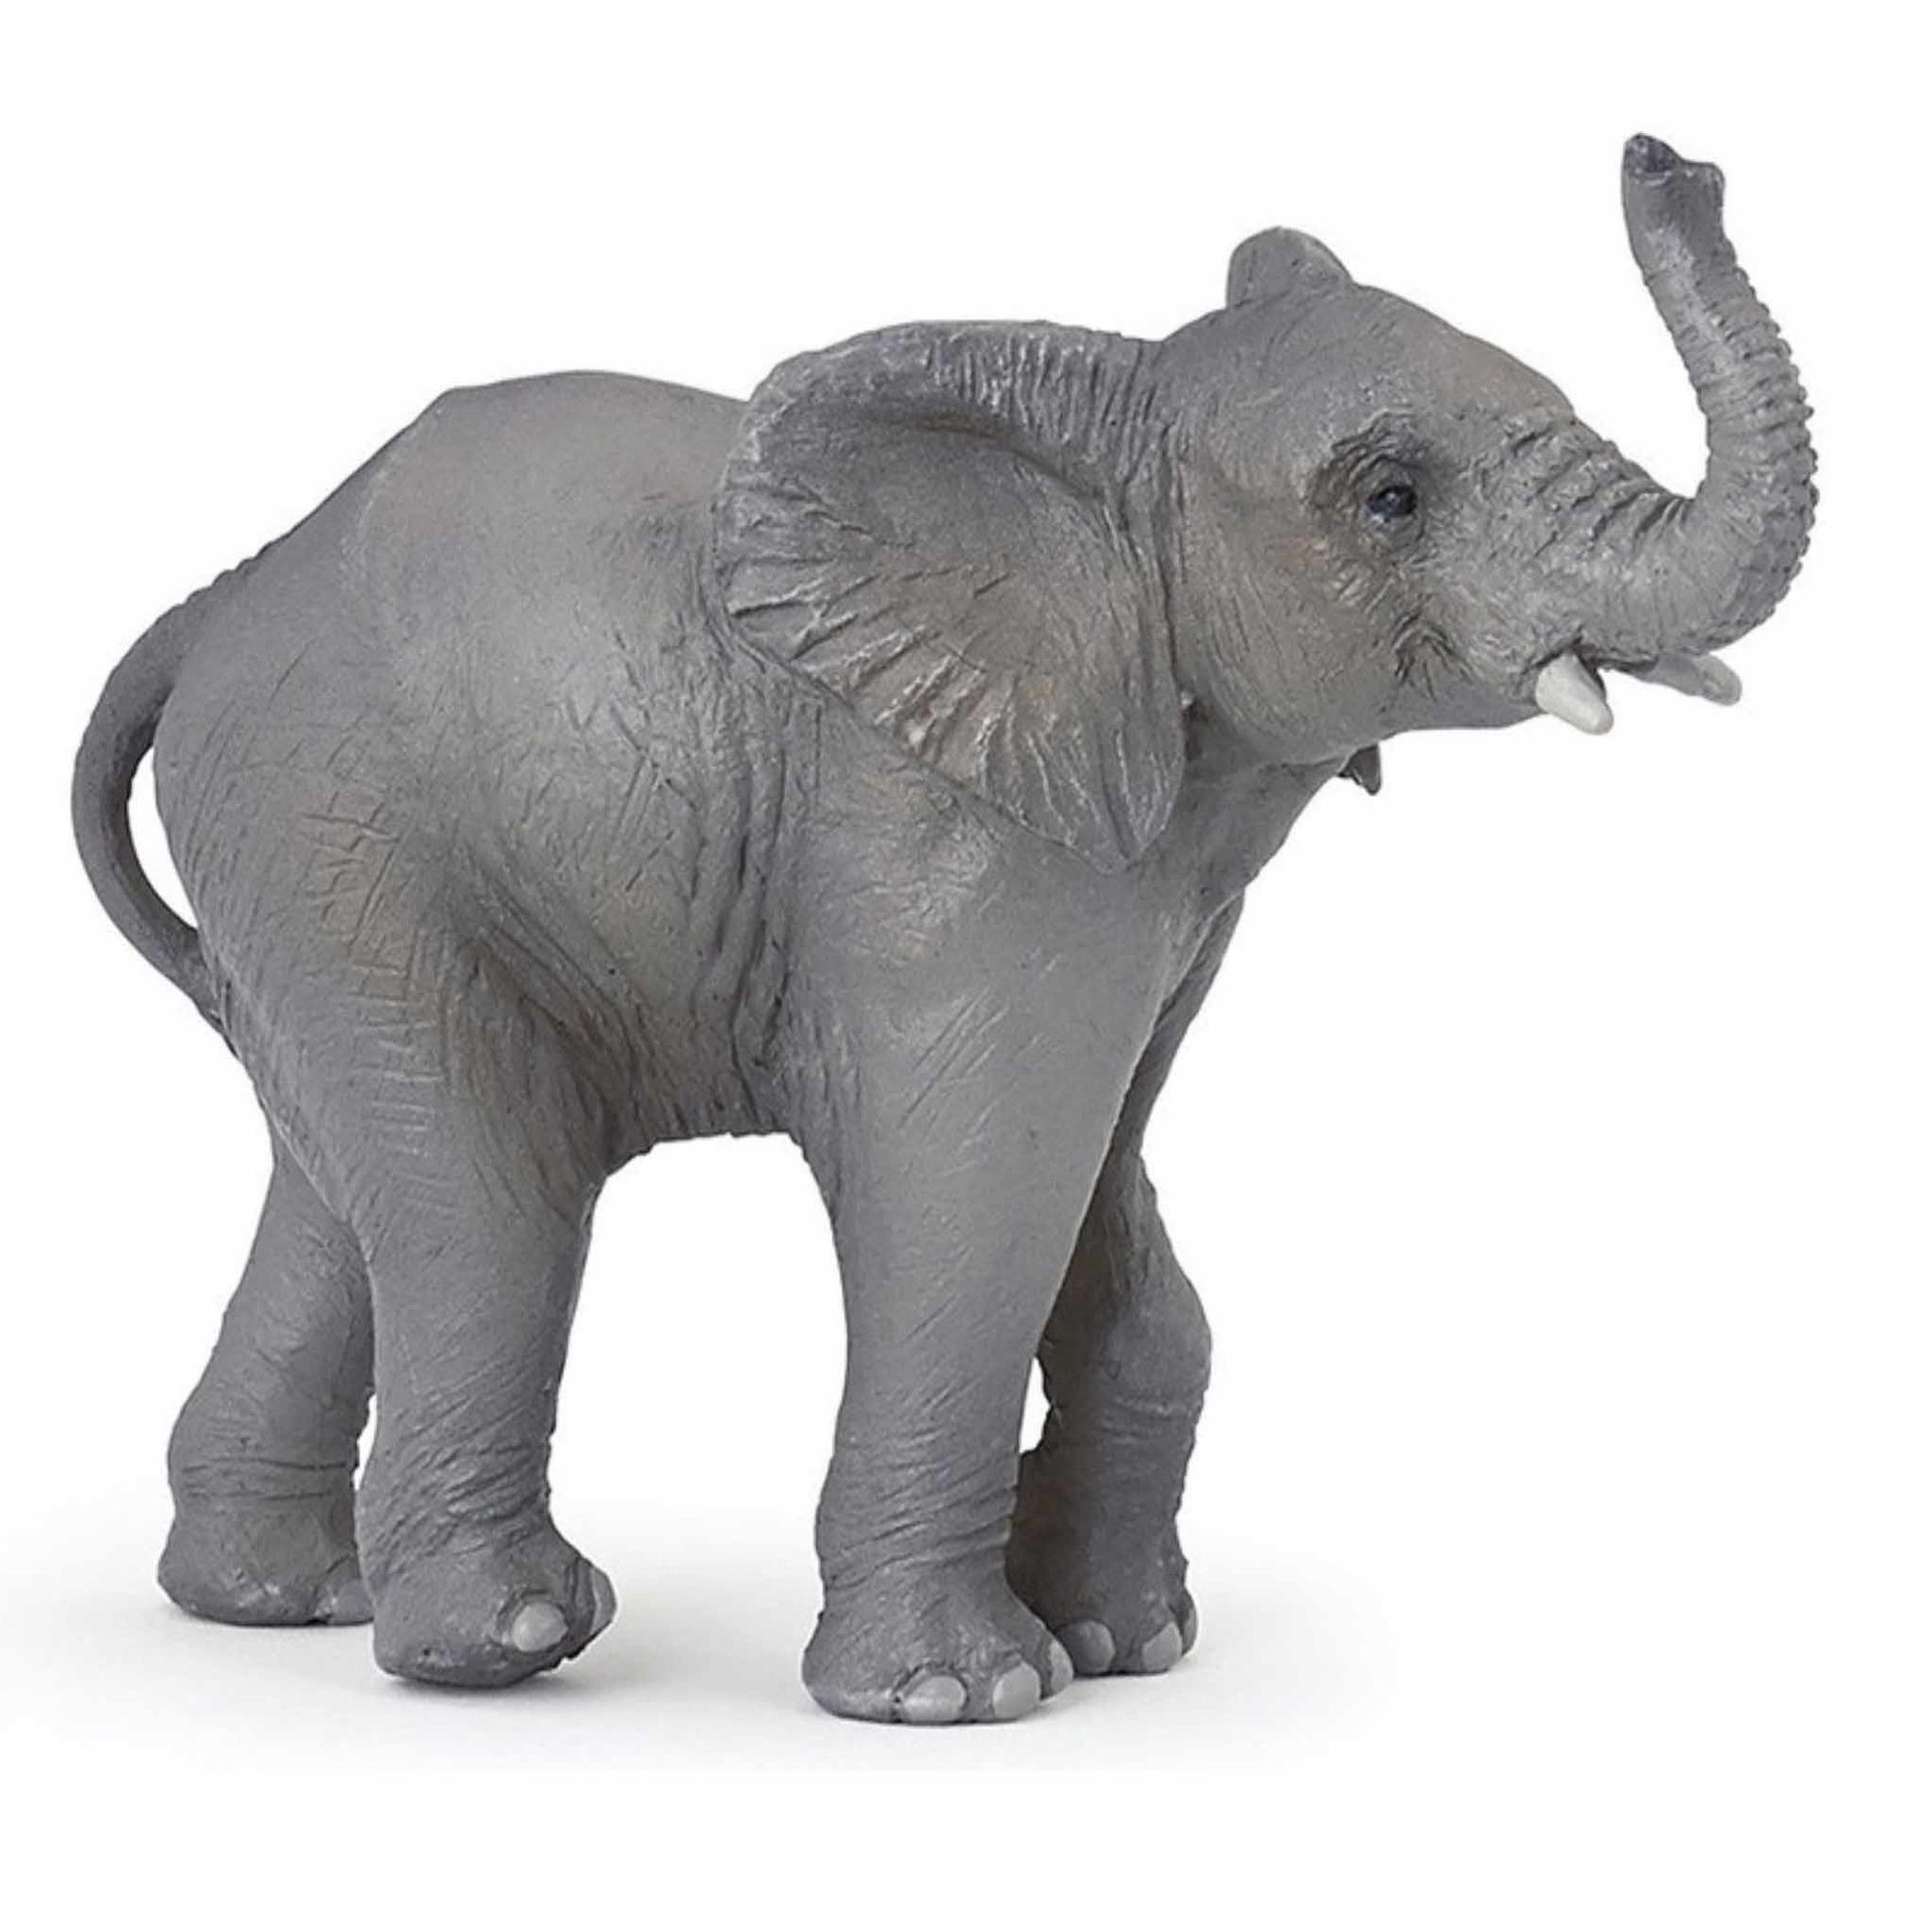 Speelfiguren sets Plastic baby olifant 11 cm